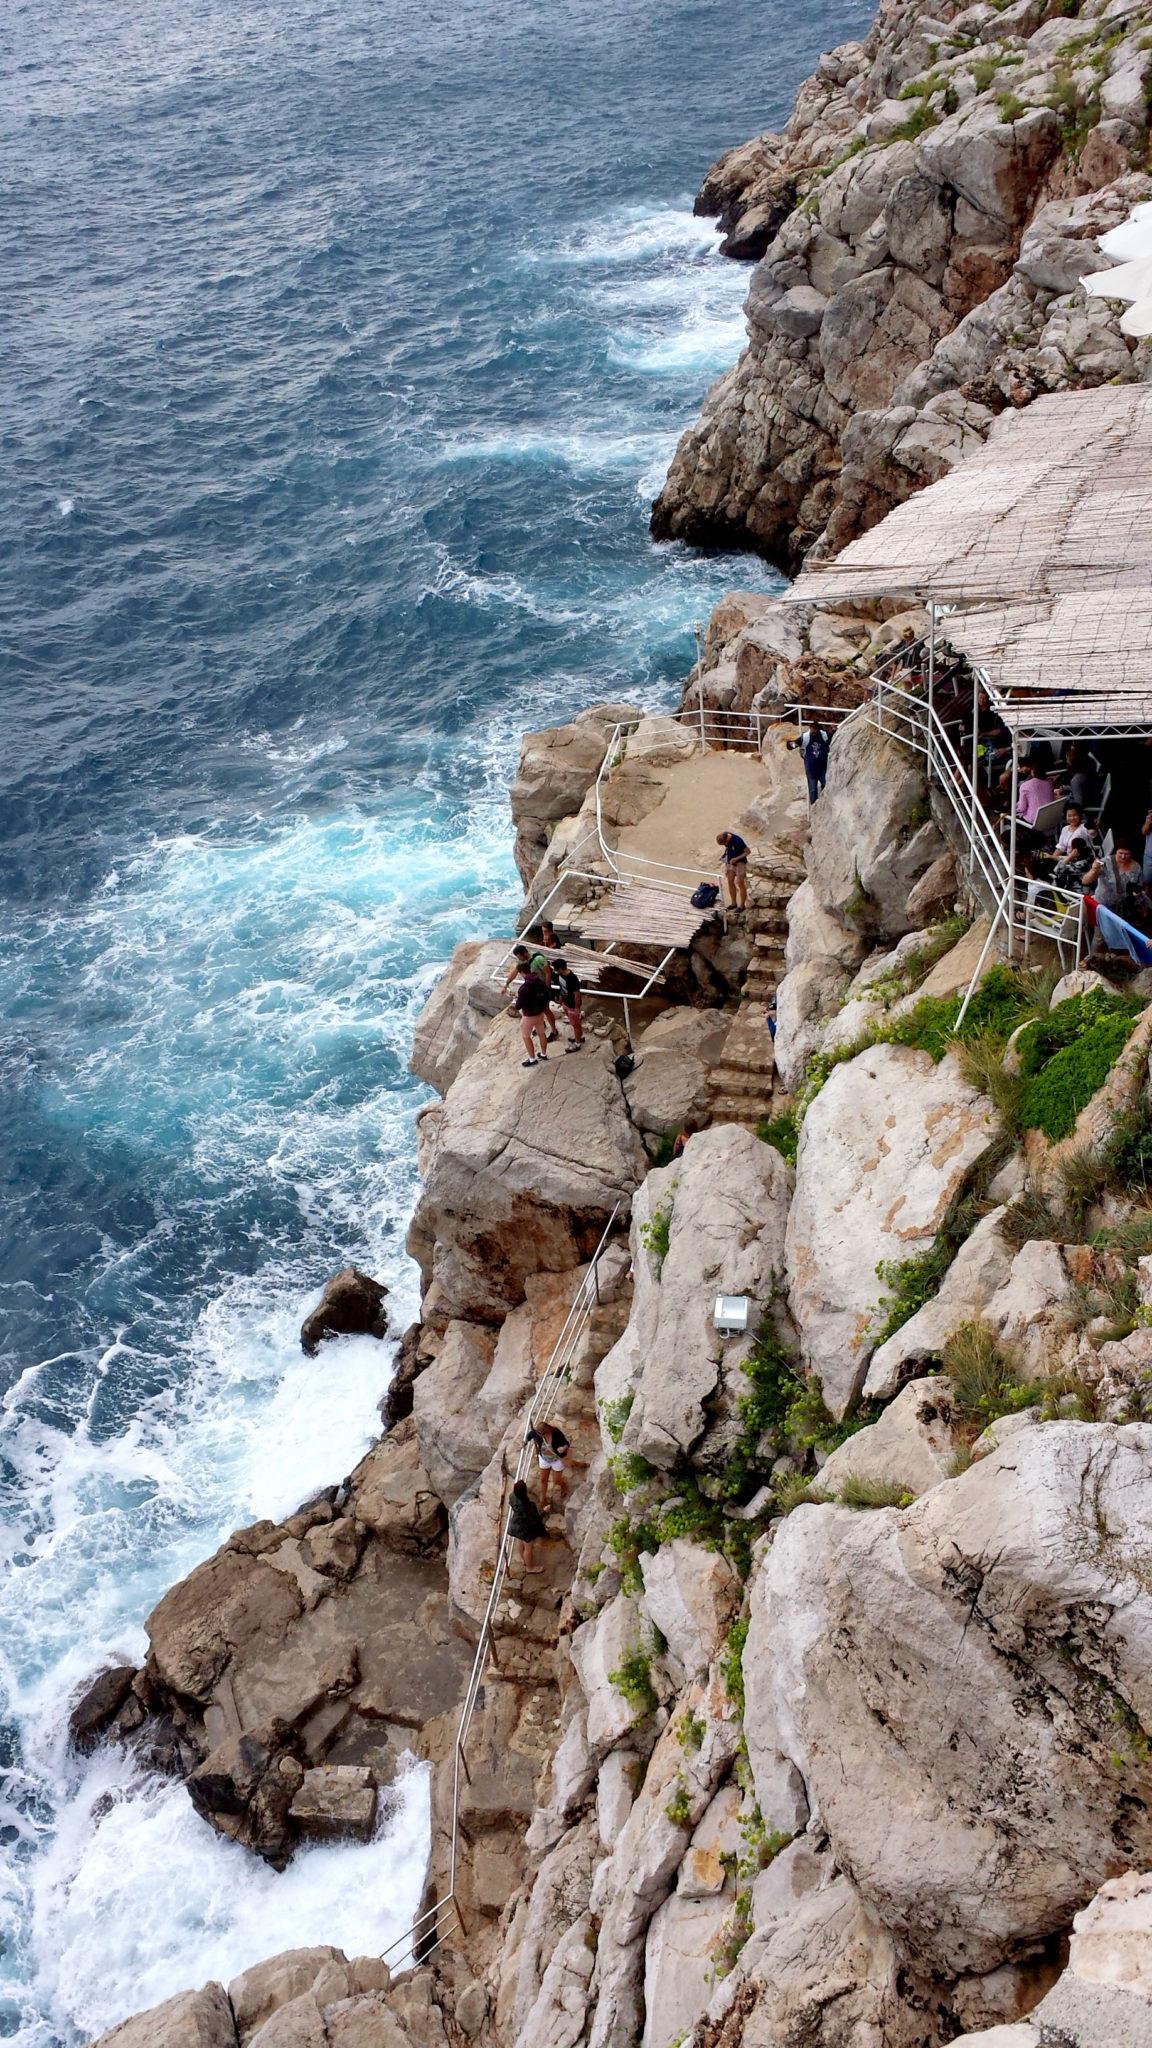 Hema_blog_mode_voyage_croatie_une_journee_a_dubrovnik_cafe_falaise